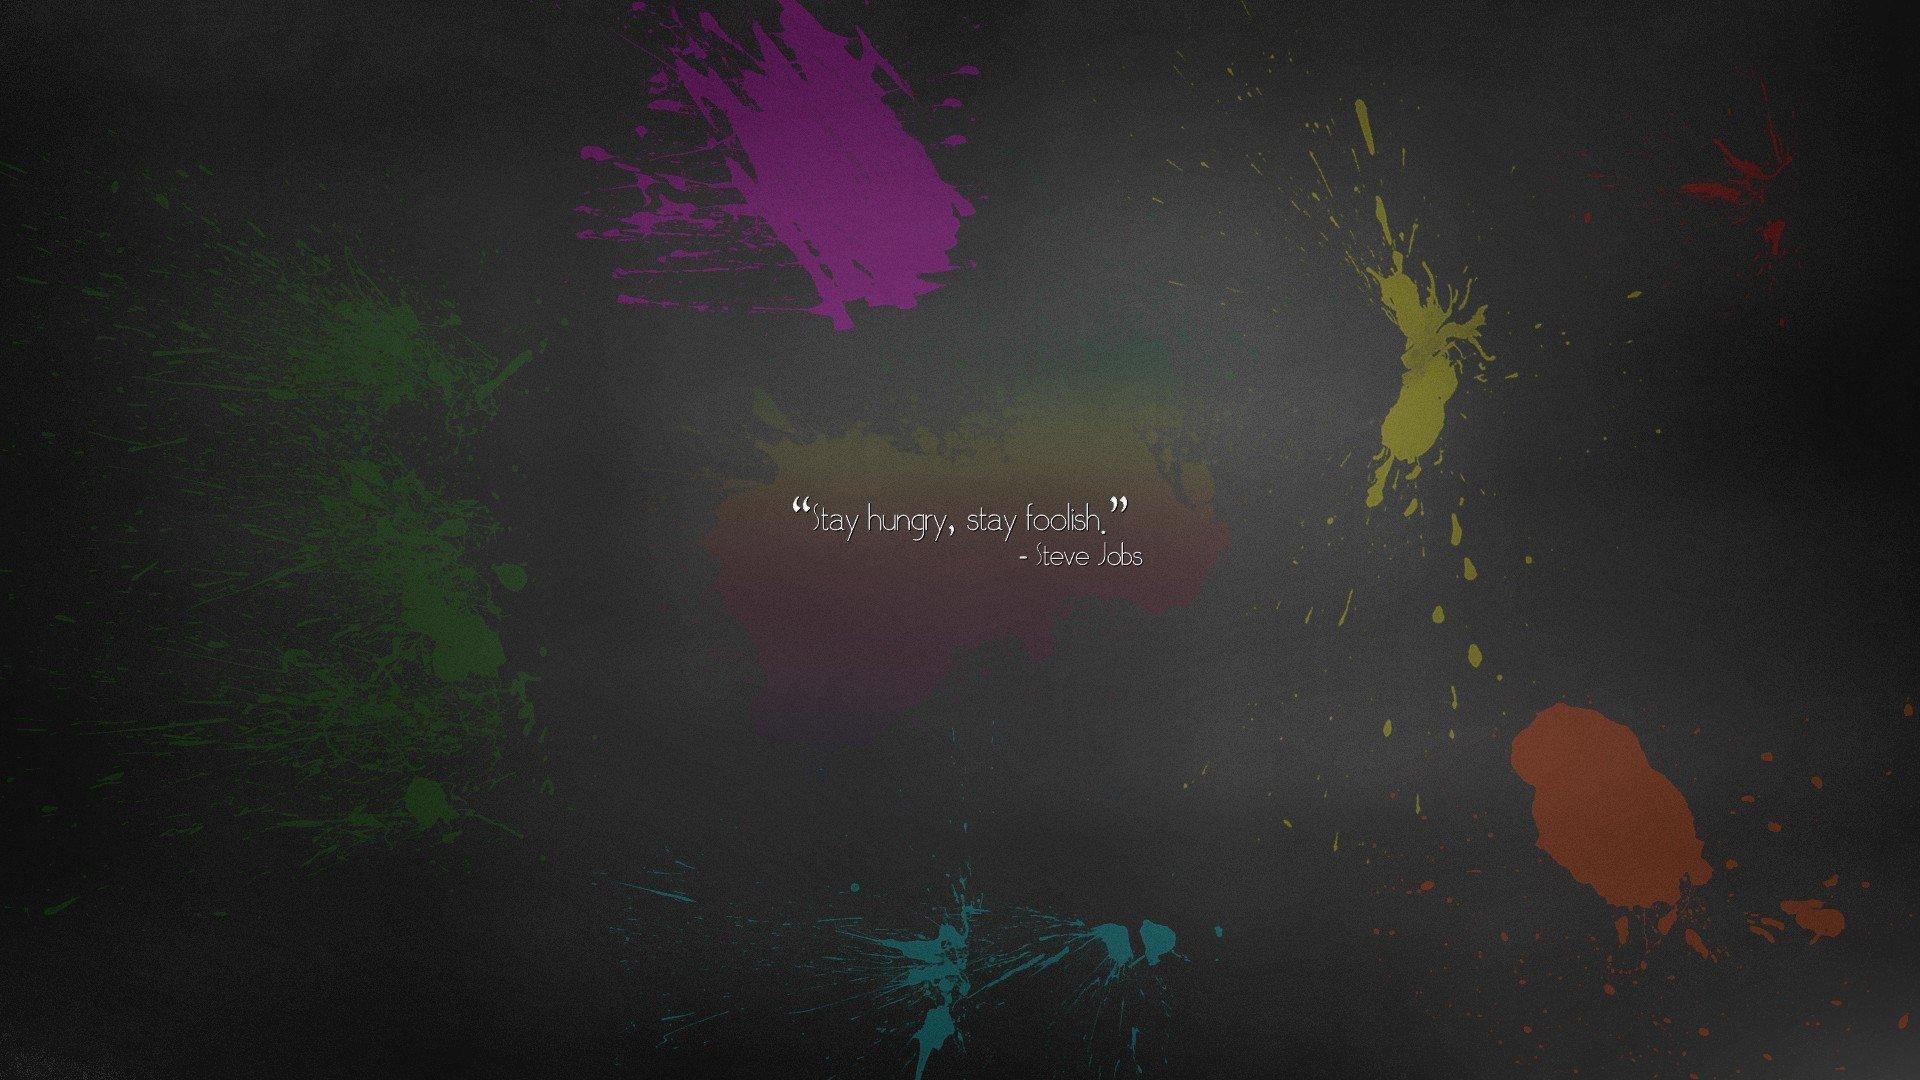 Abstract Minimalistic Apple Inc Quotes Paint Rainbows Steve Jobs